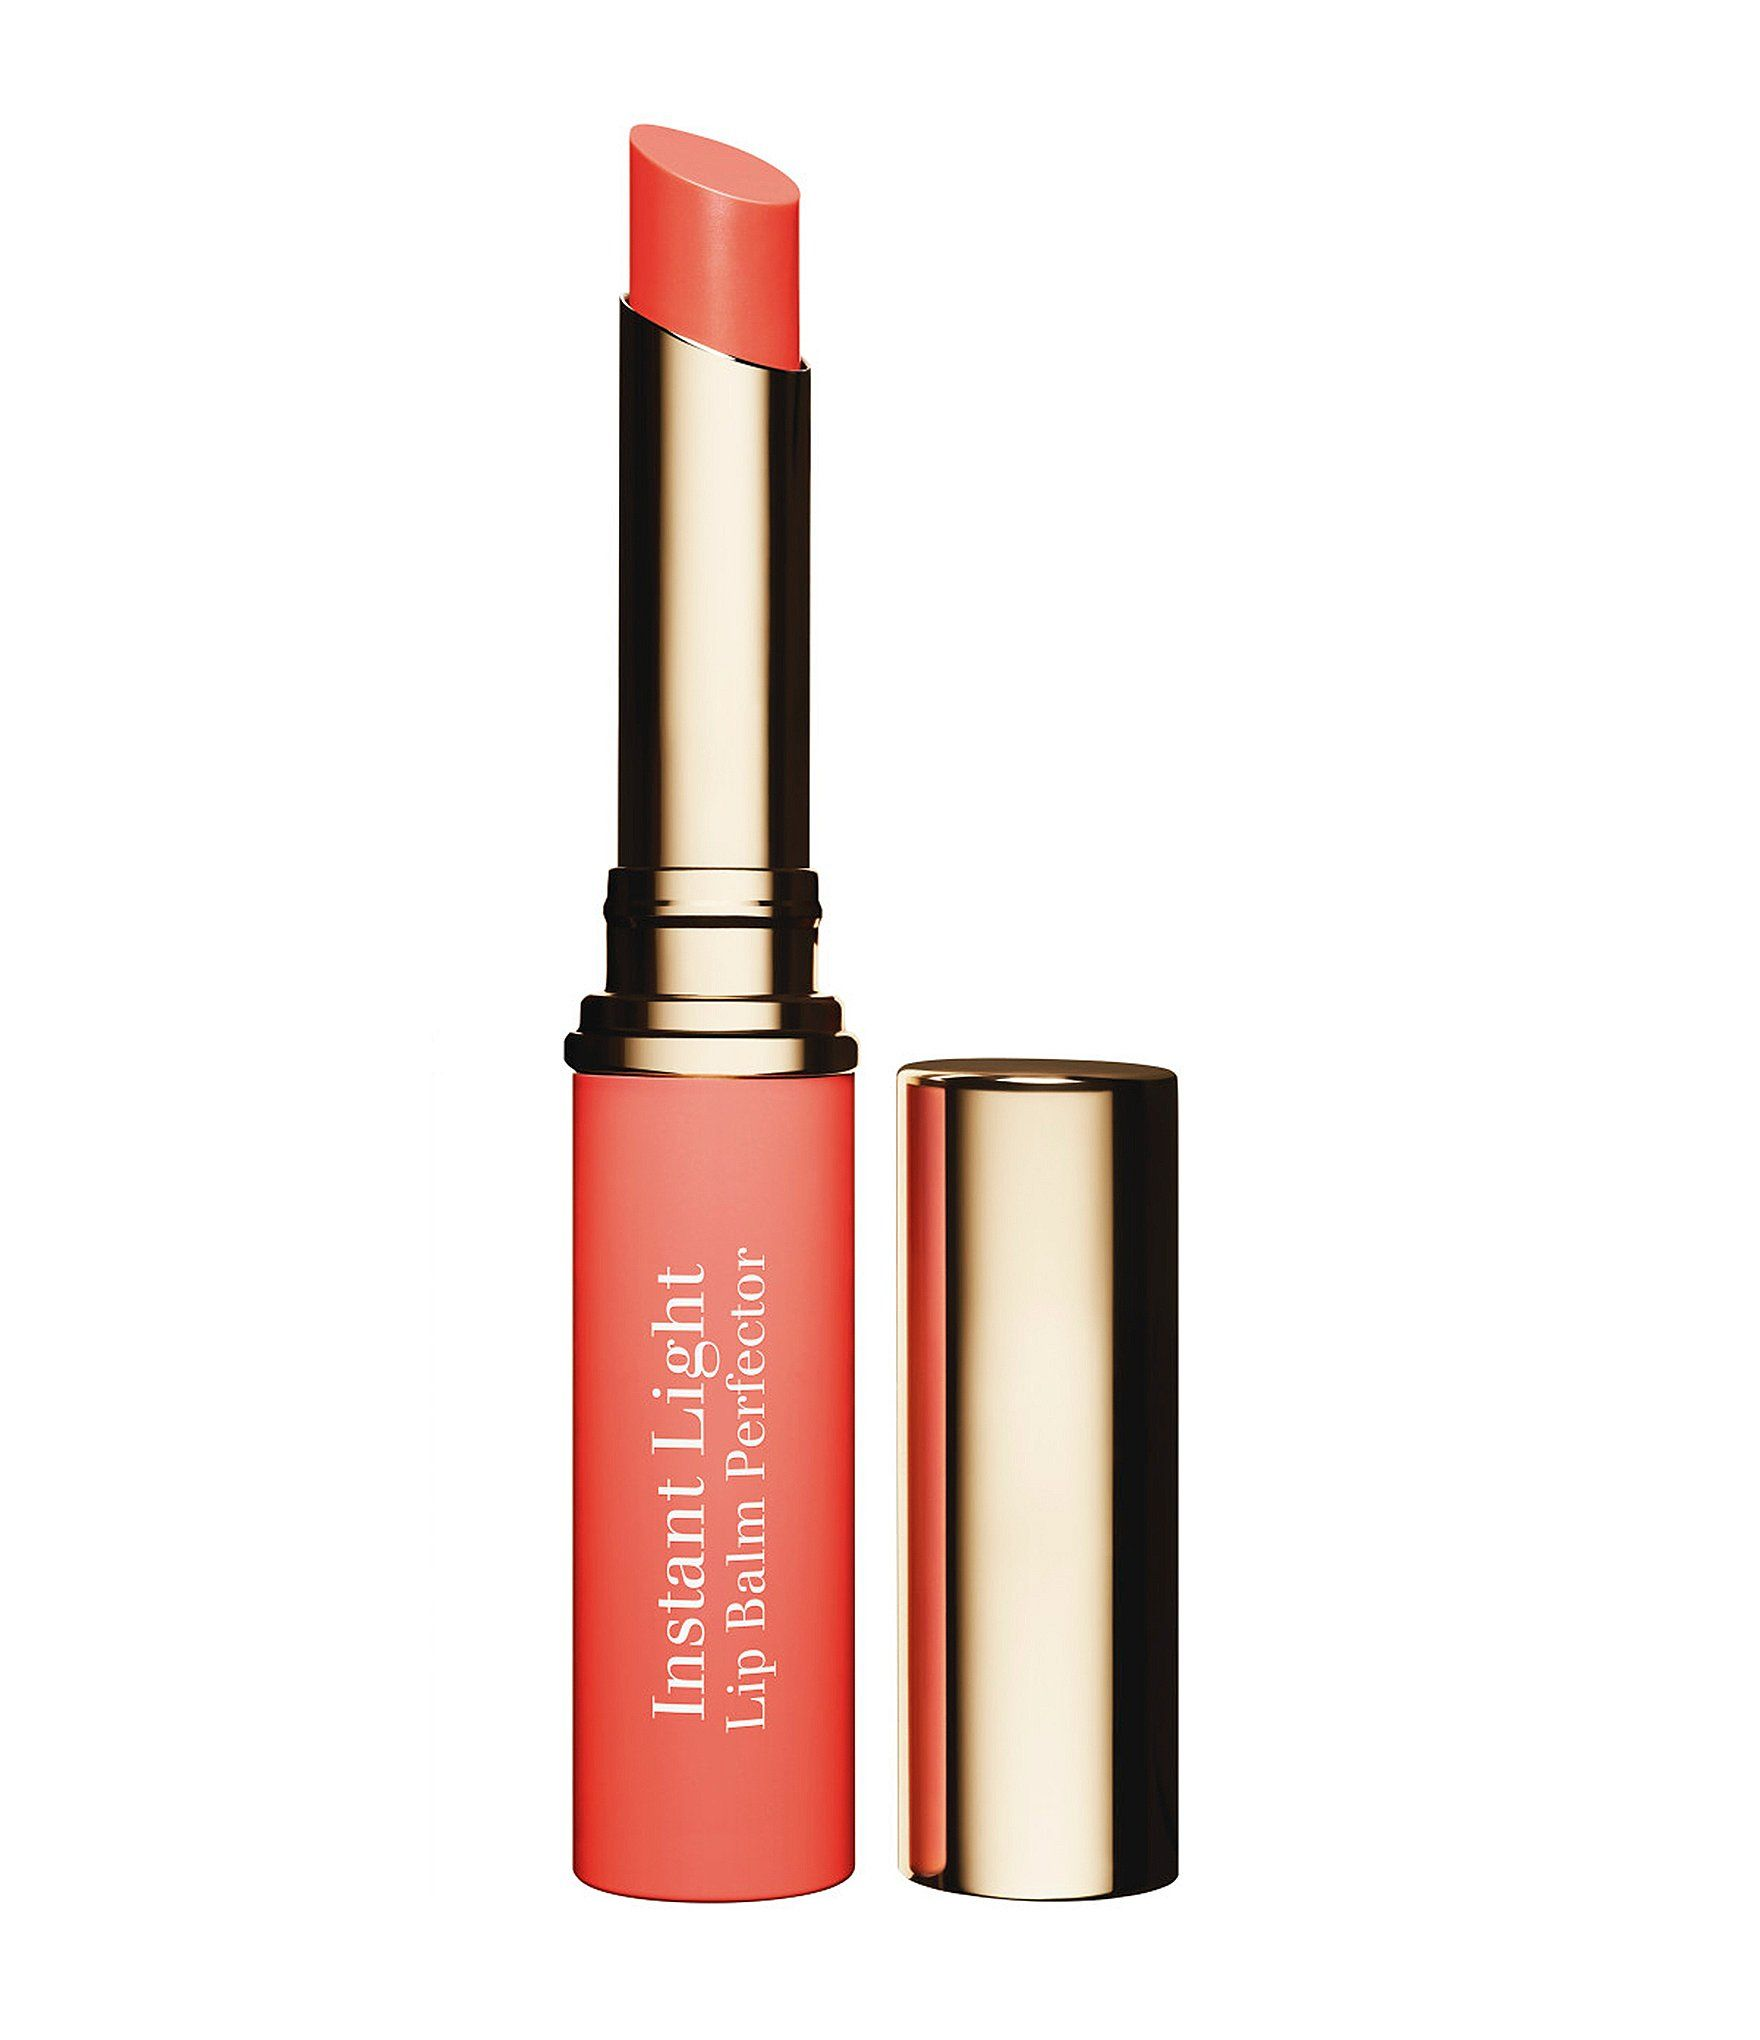 Clarins instant light lip balm perfector dillards in